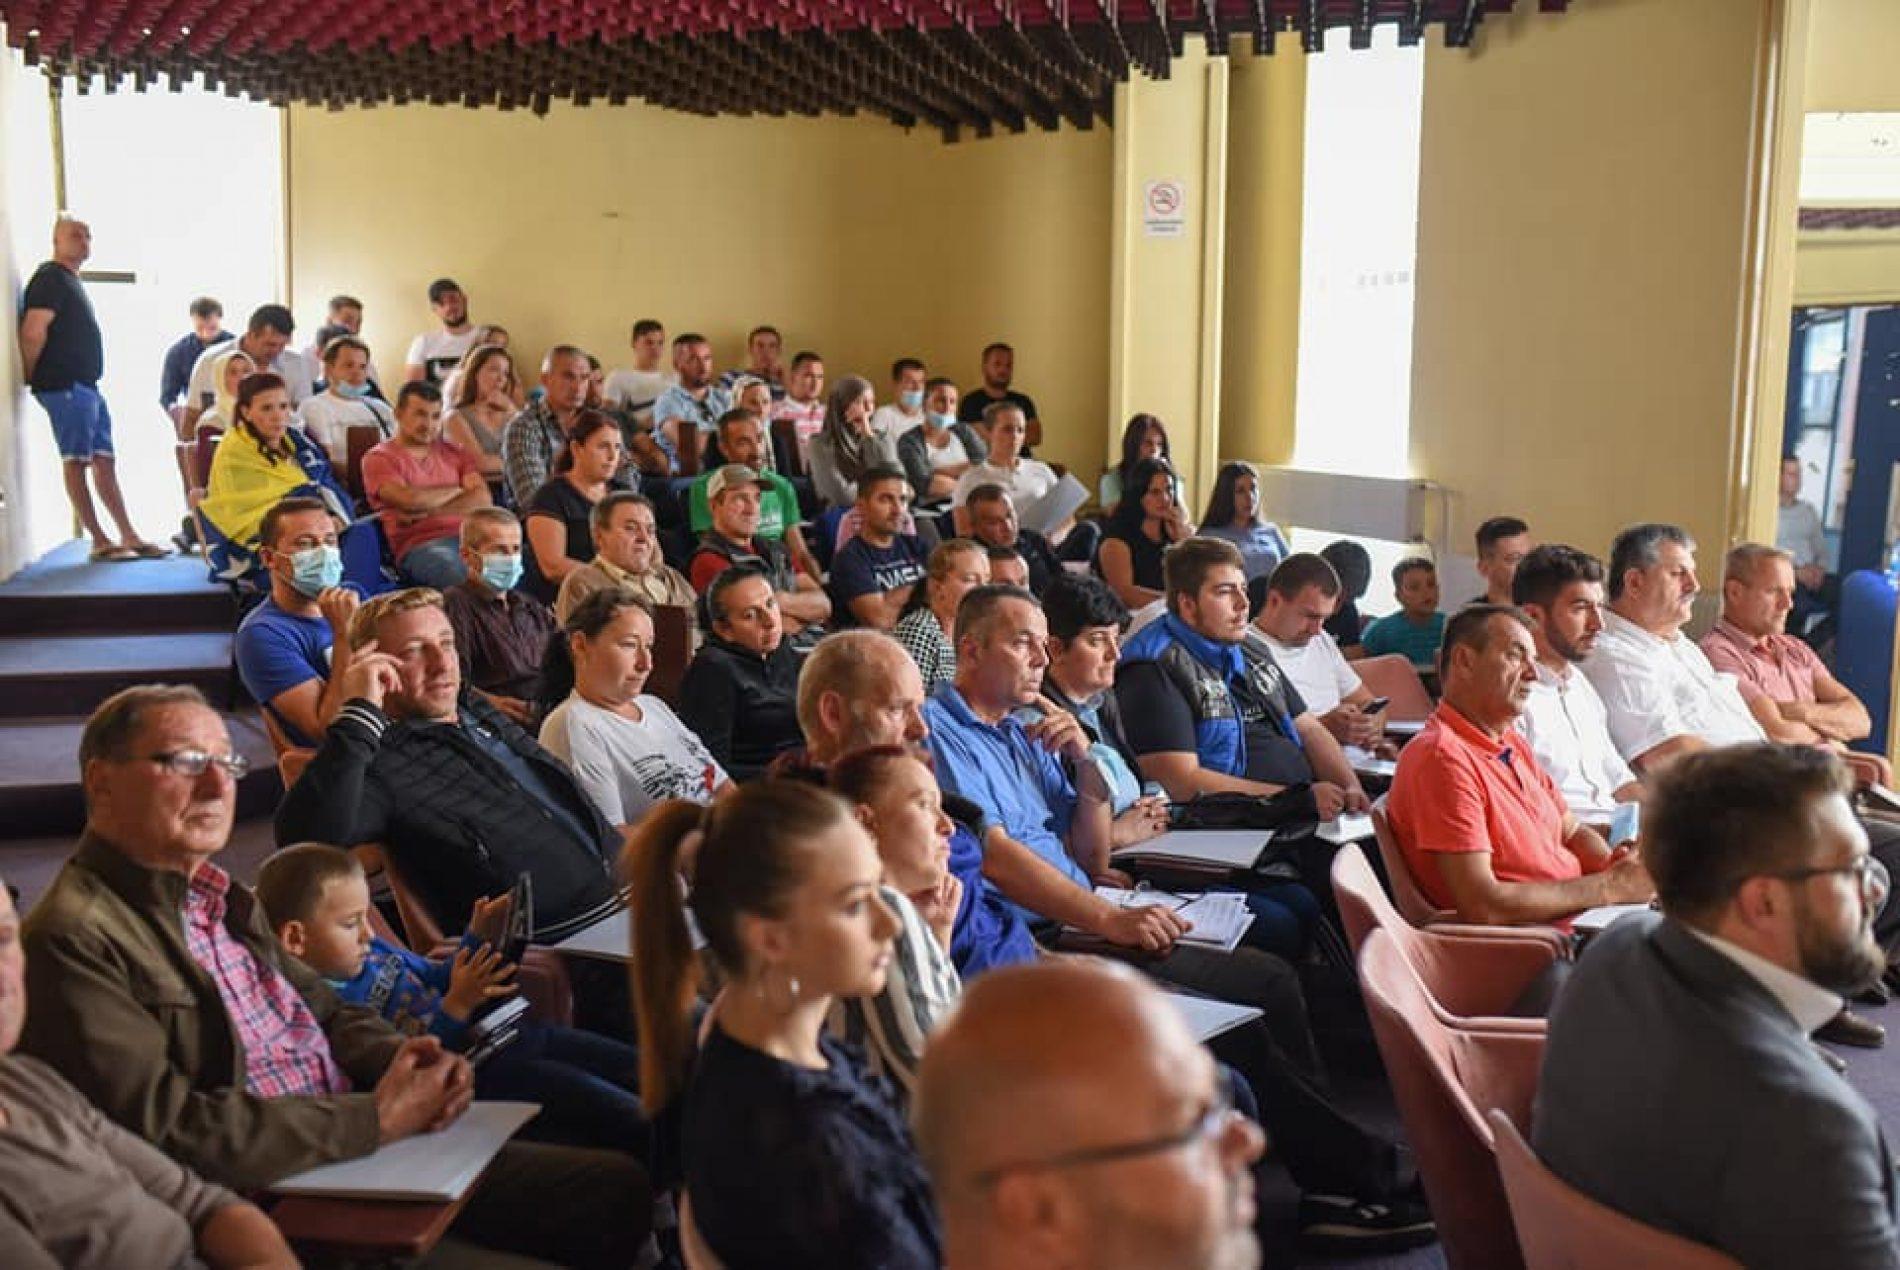 Održana skupština OO SBiH Srebrenica: Sedamdeset delegata izabrali Općinski savjet